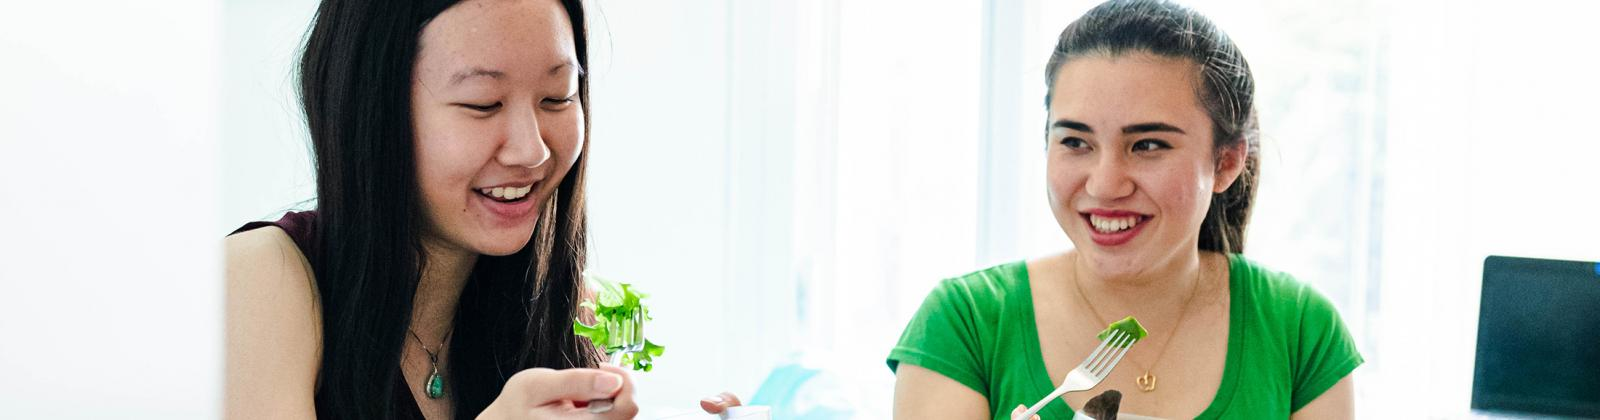 student eating salad